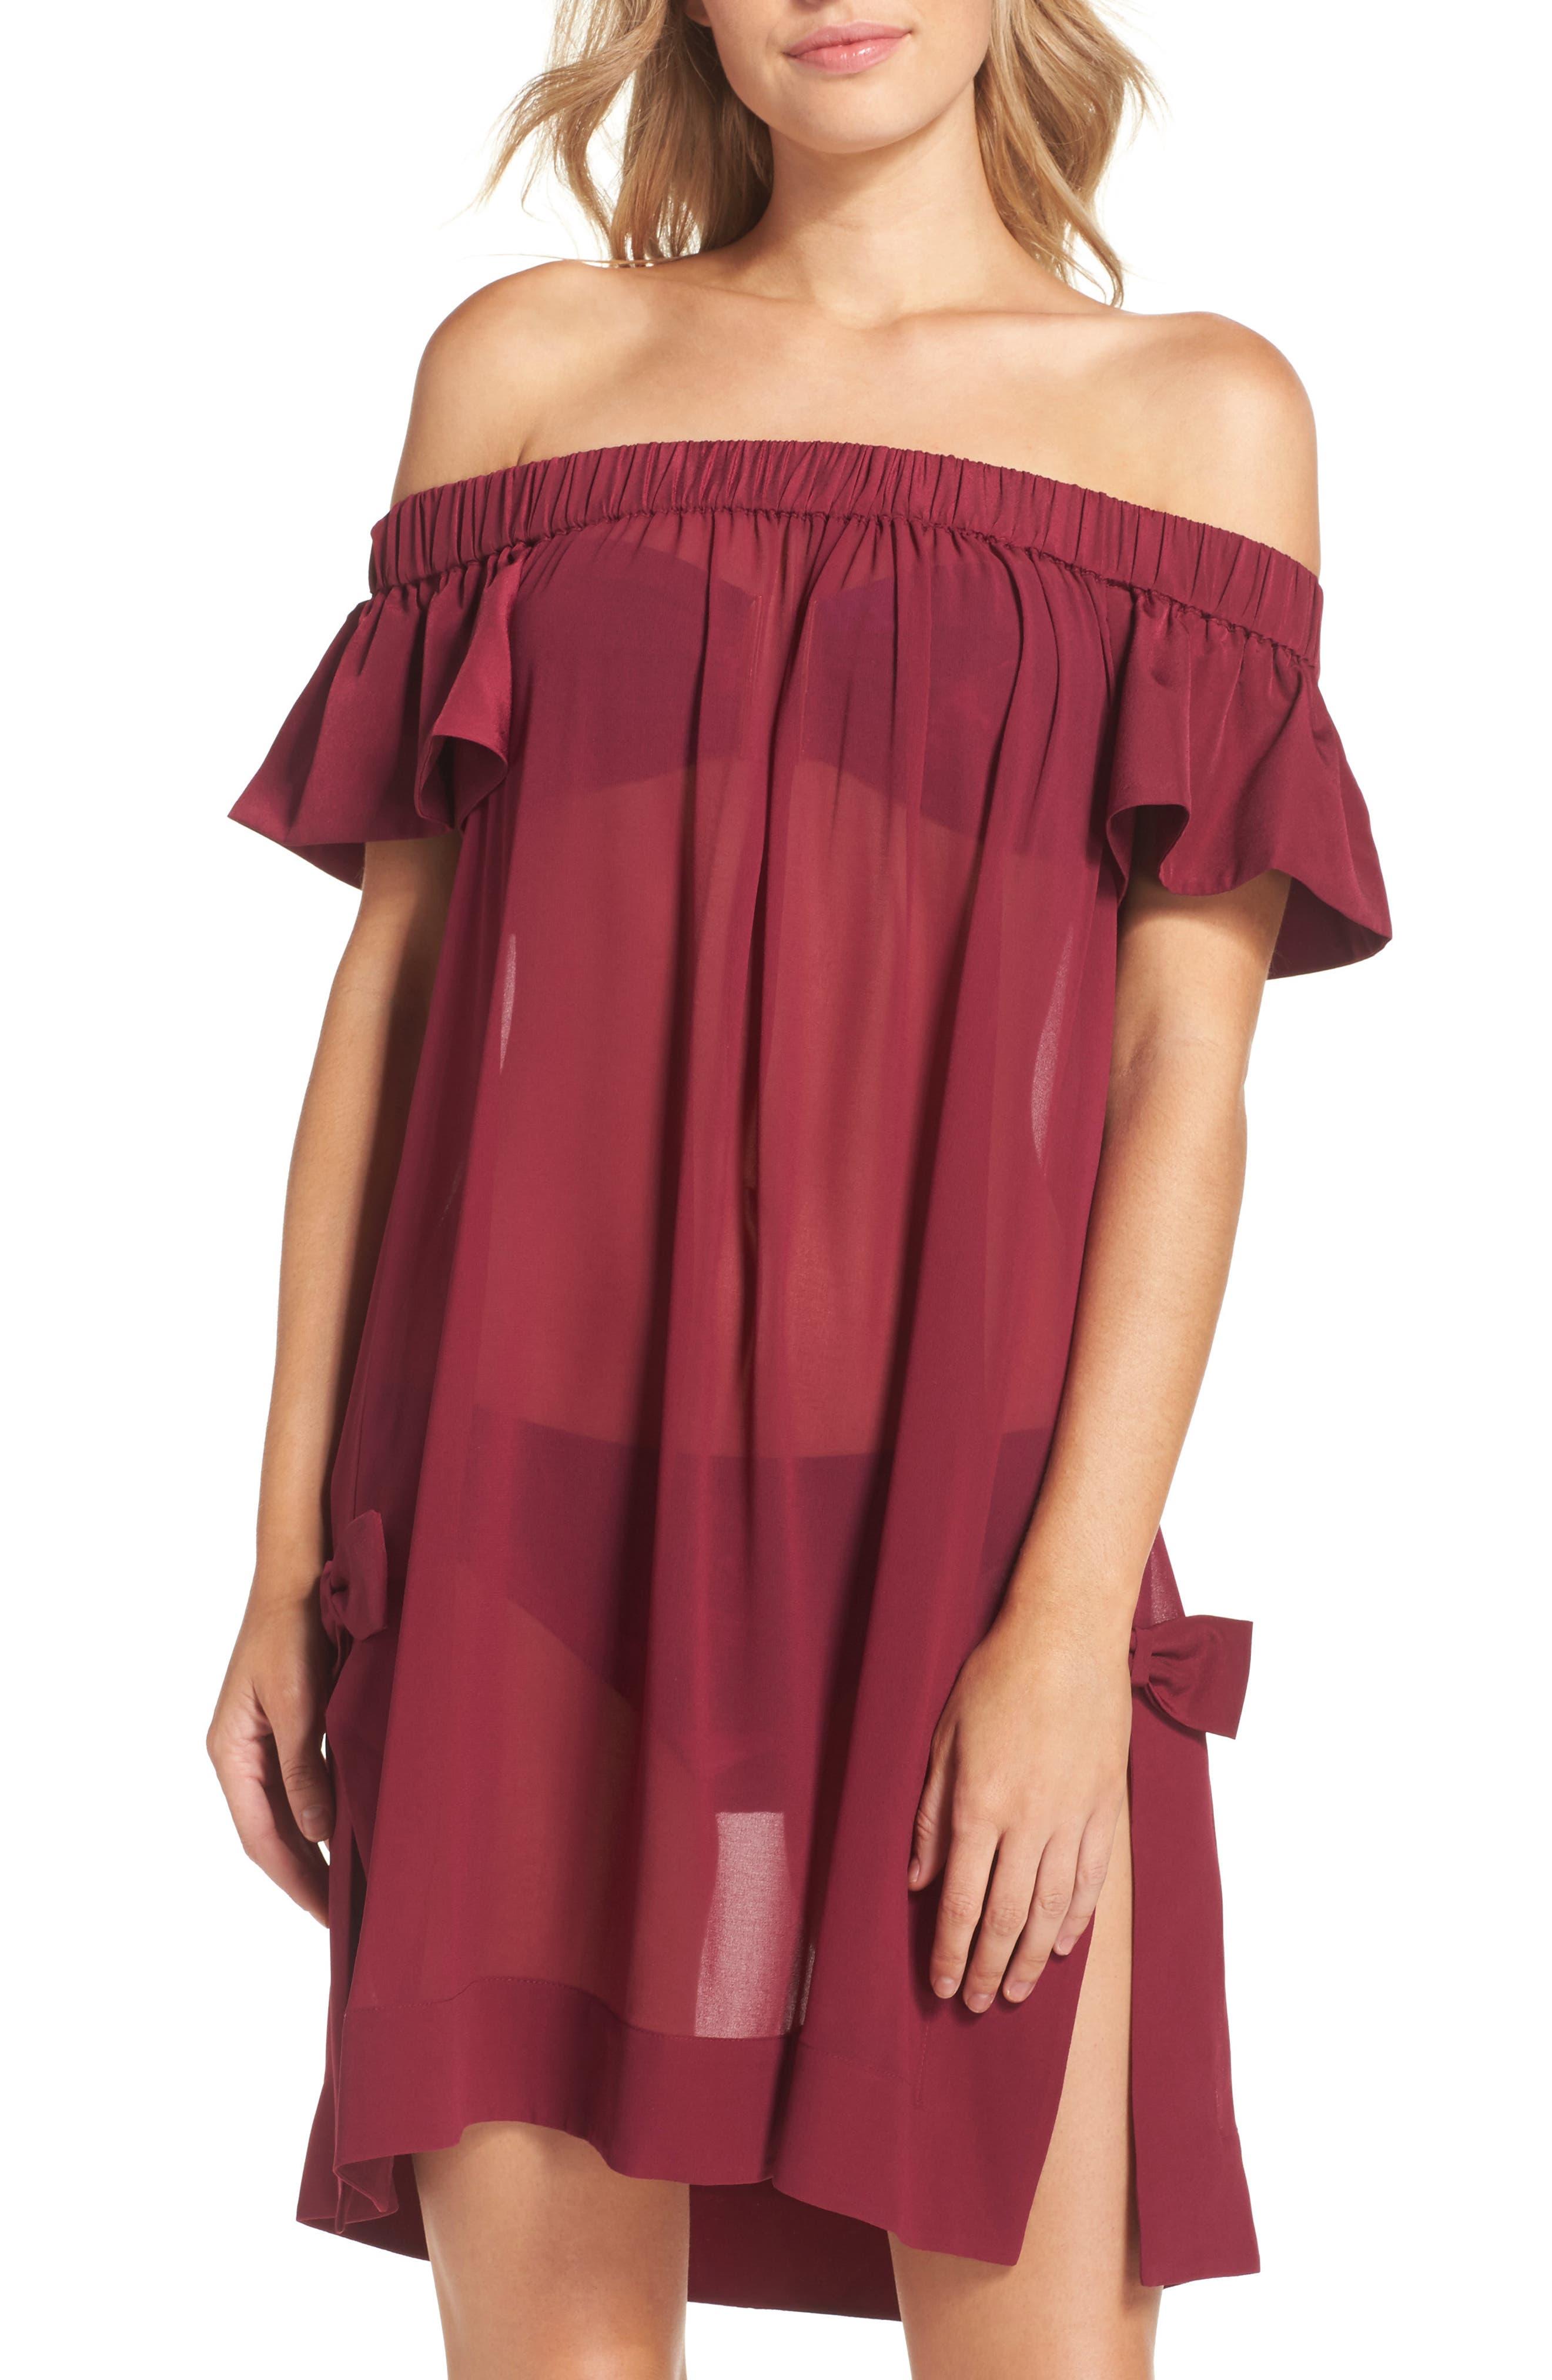 Alternate Image 1 Selected - Ted Baker London Anete Bardot Cover-Up Dress